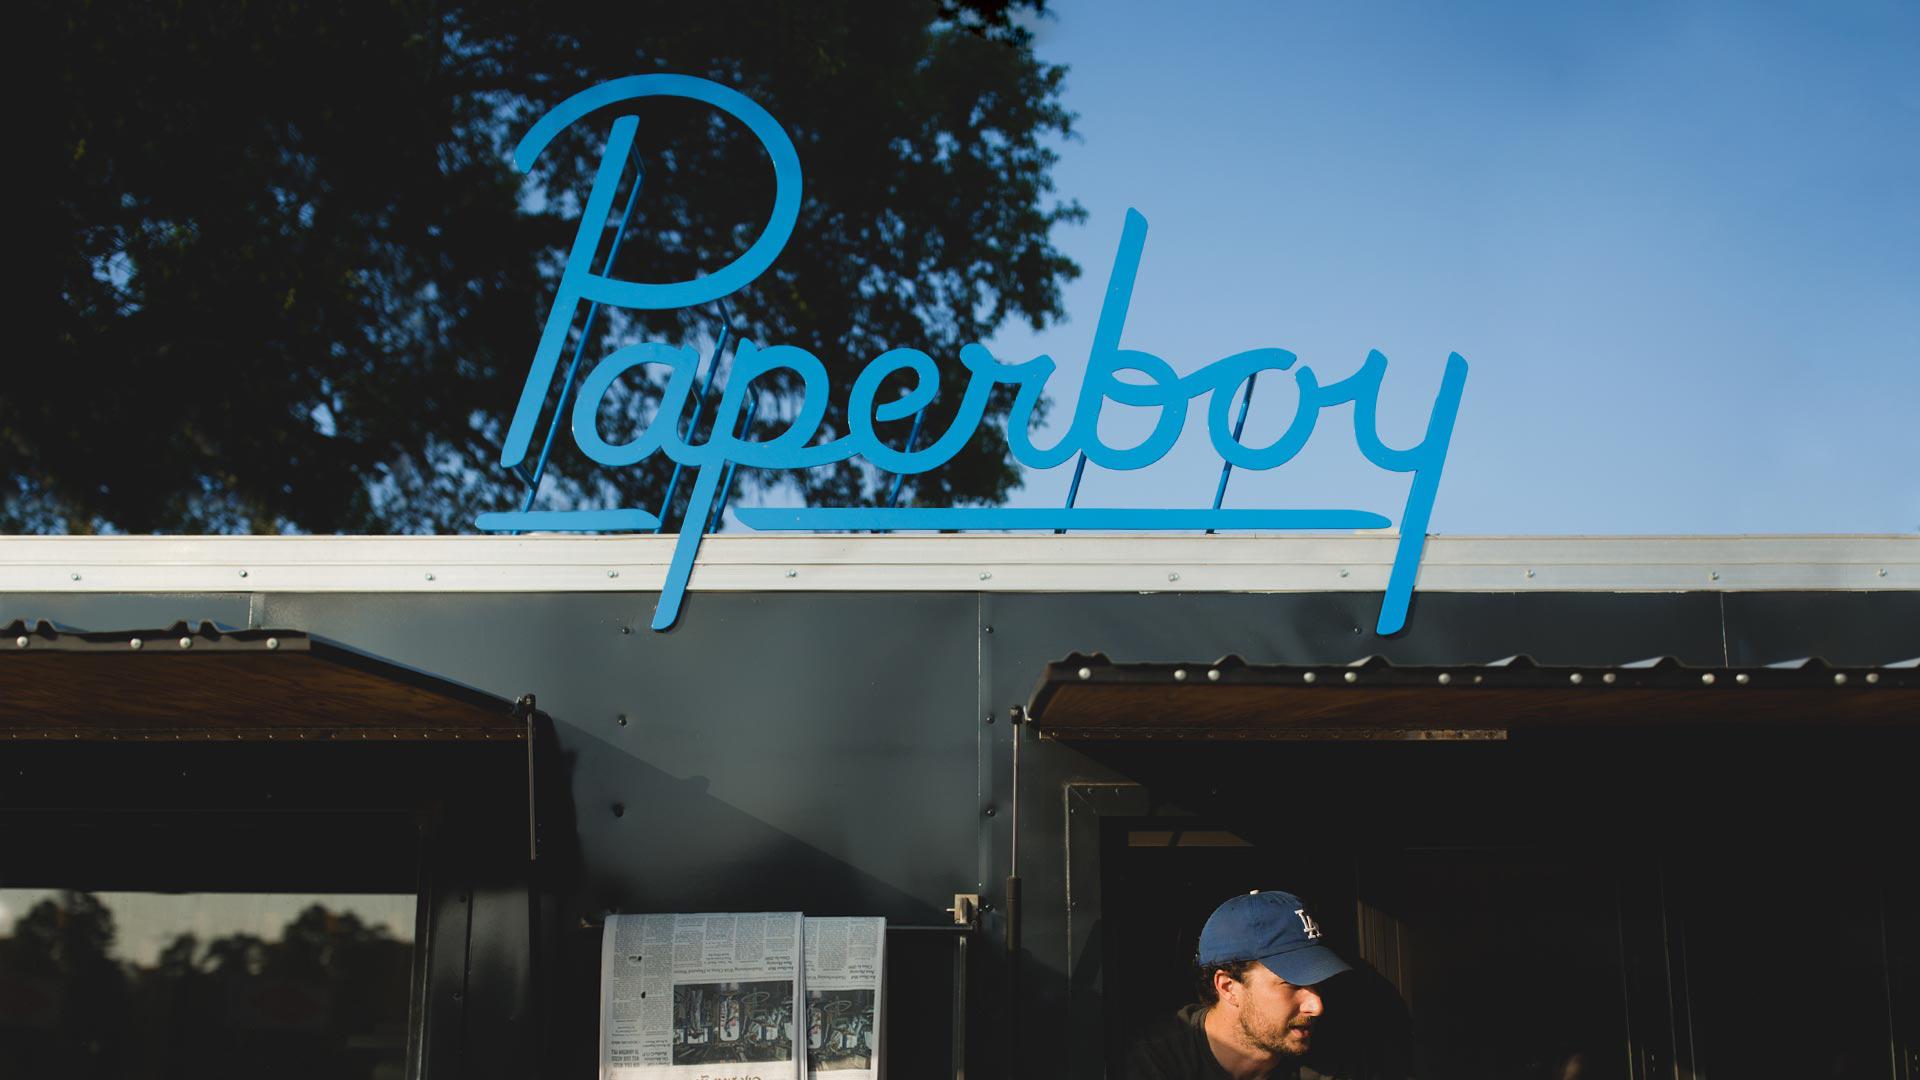 paperboy_fullscale_hero.jpg